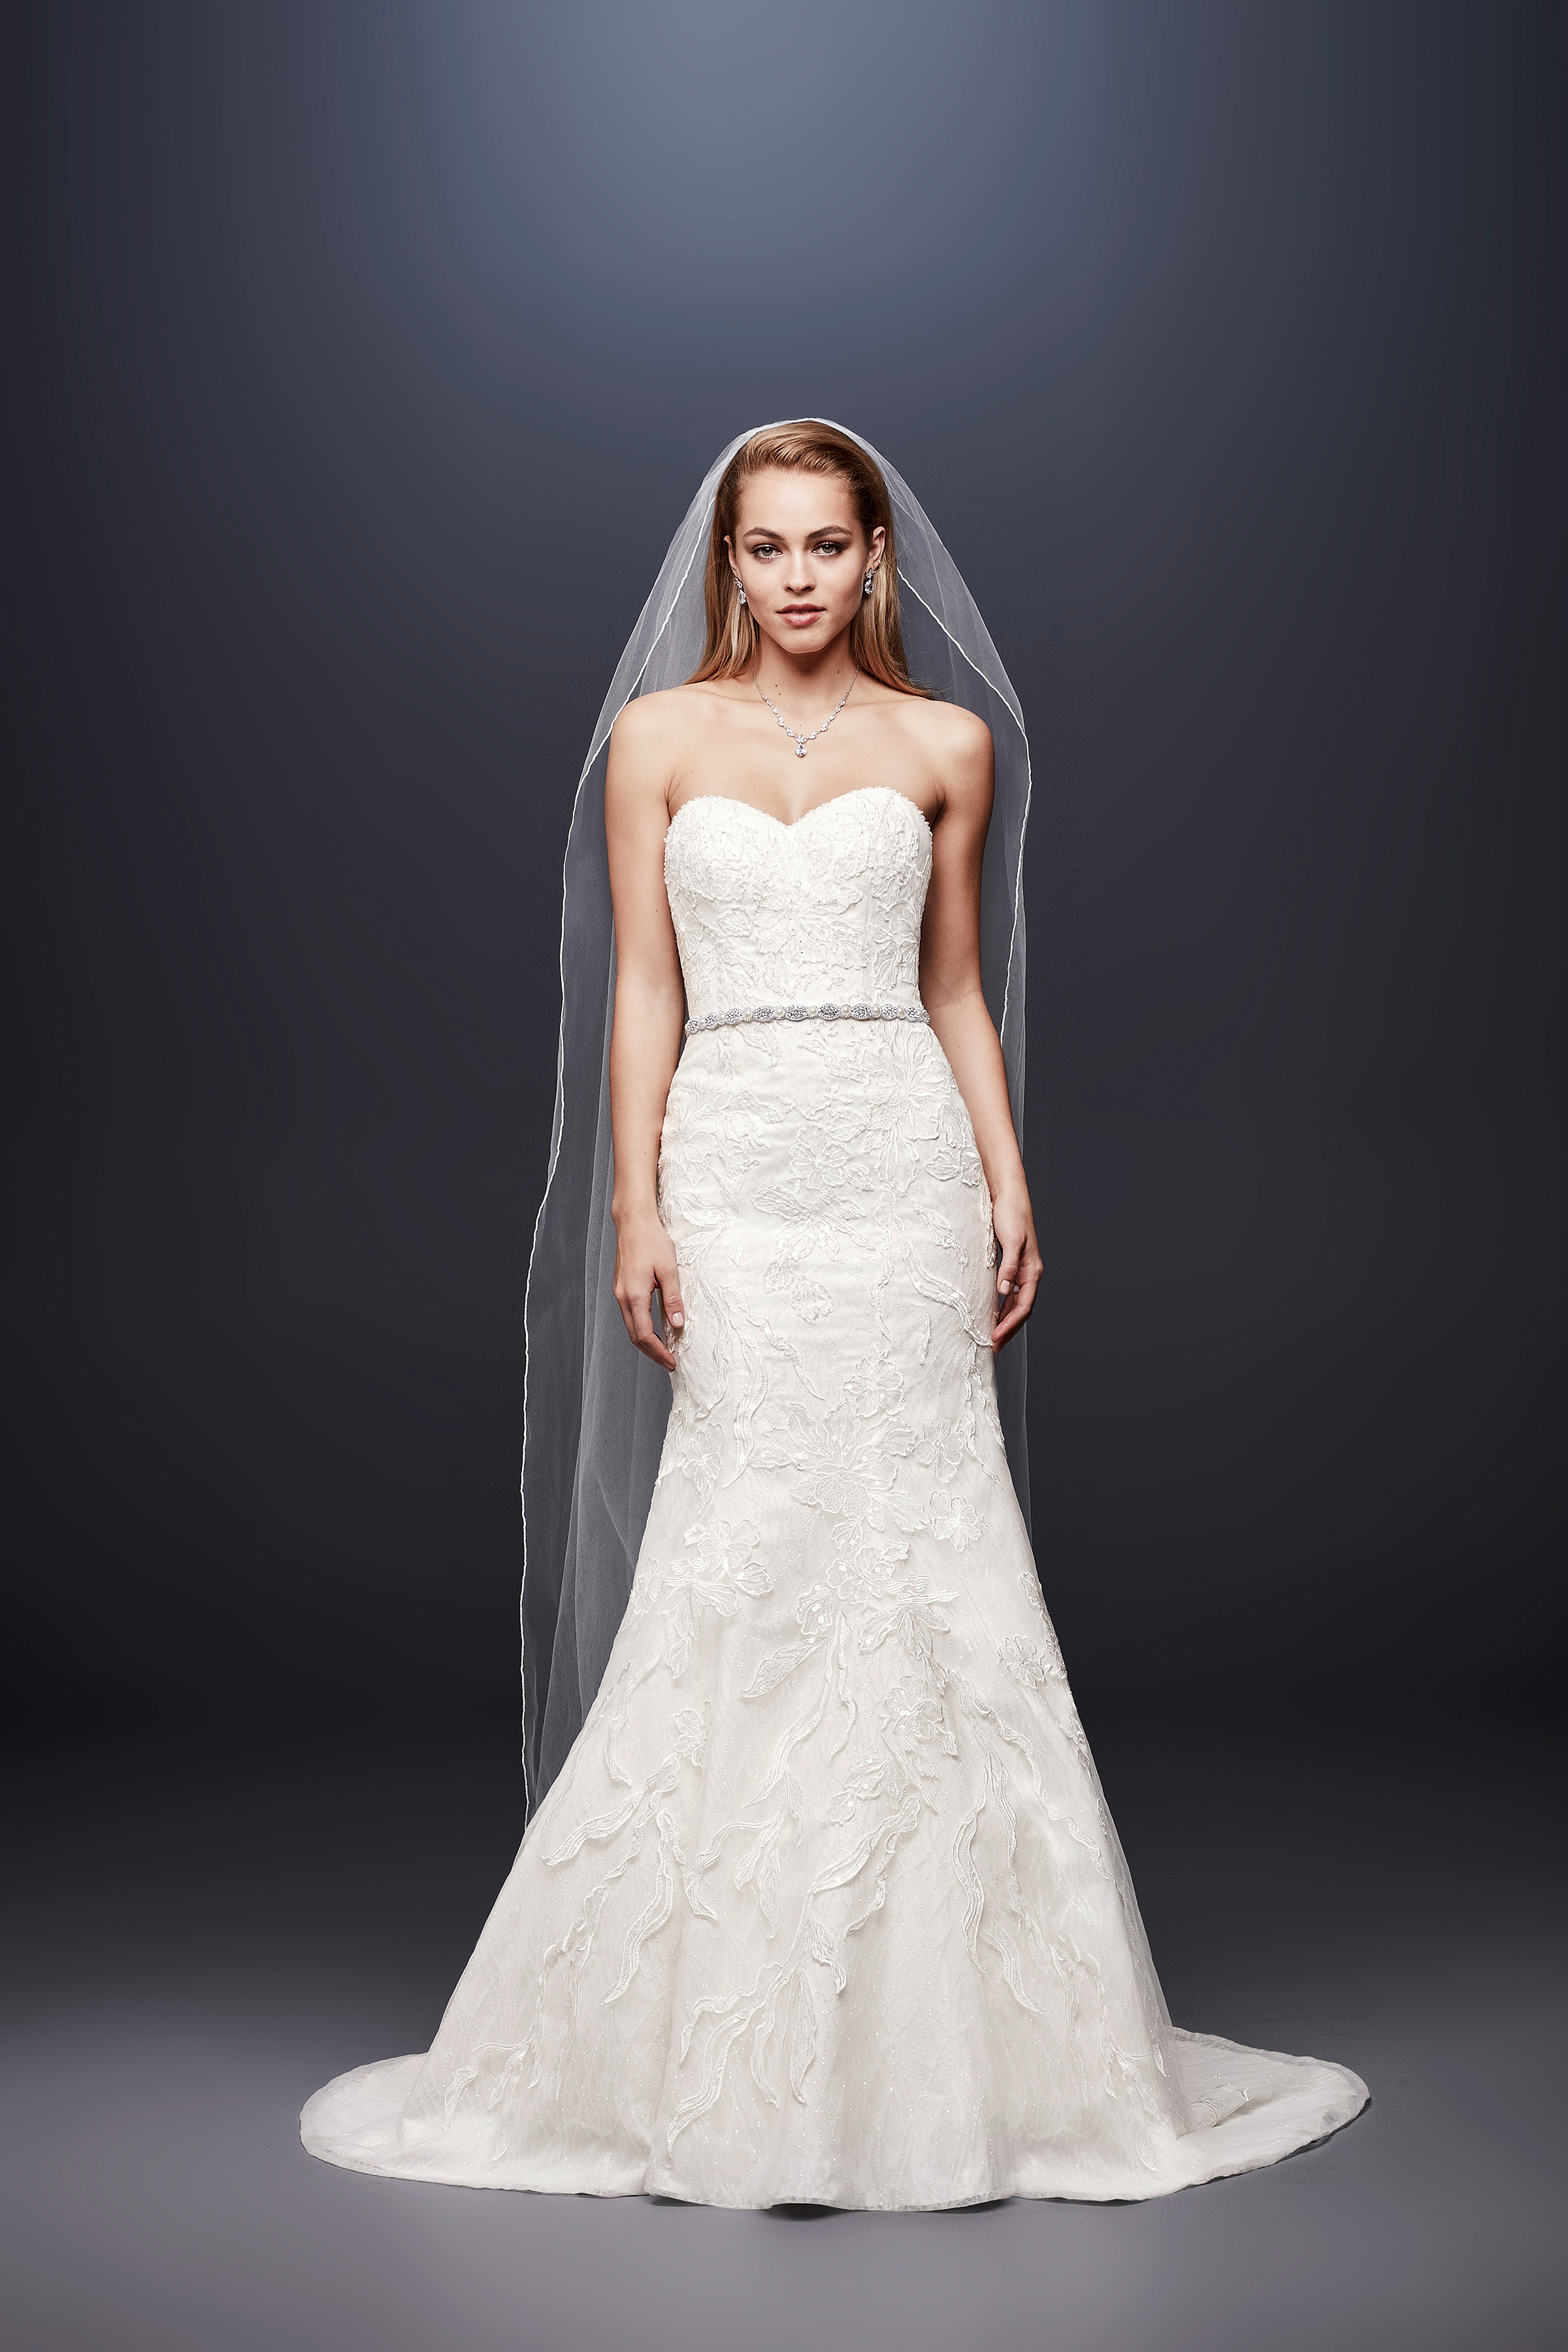 david bridal wedding dress spring 2019 trumpet lace sweatheart